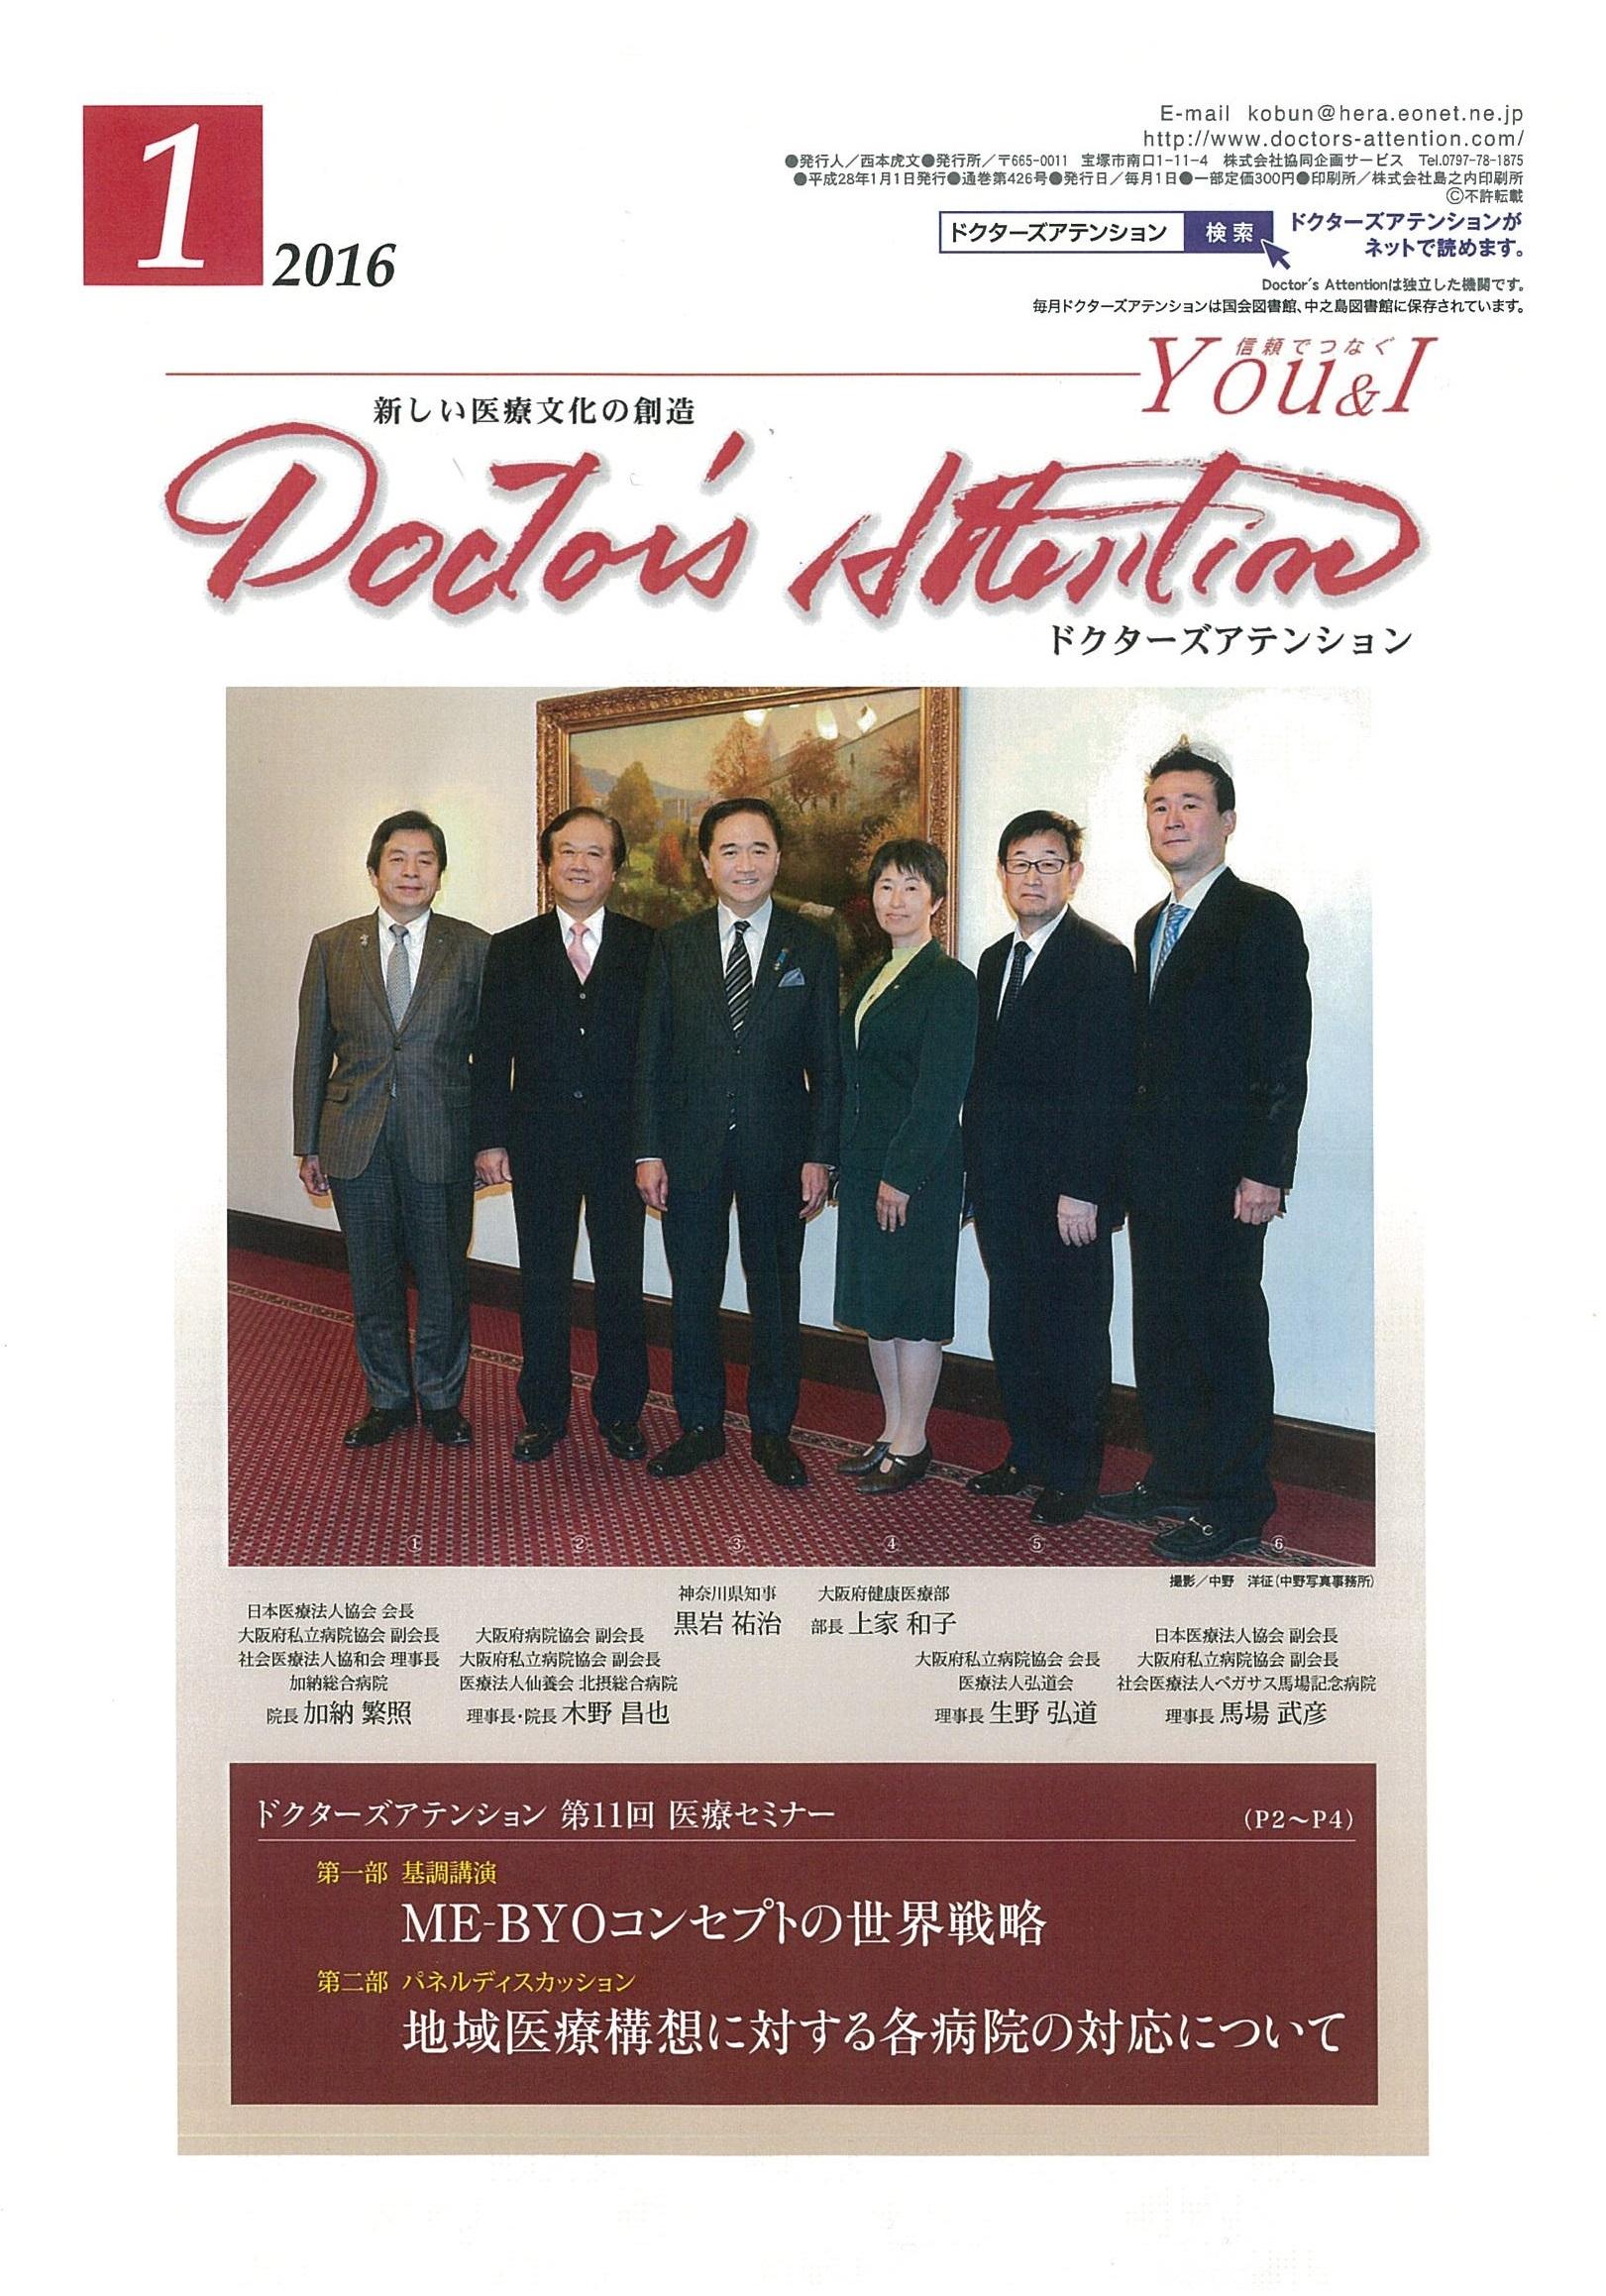 Doctors attention|ドクターズアテンション|医療専門紙